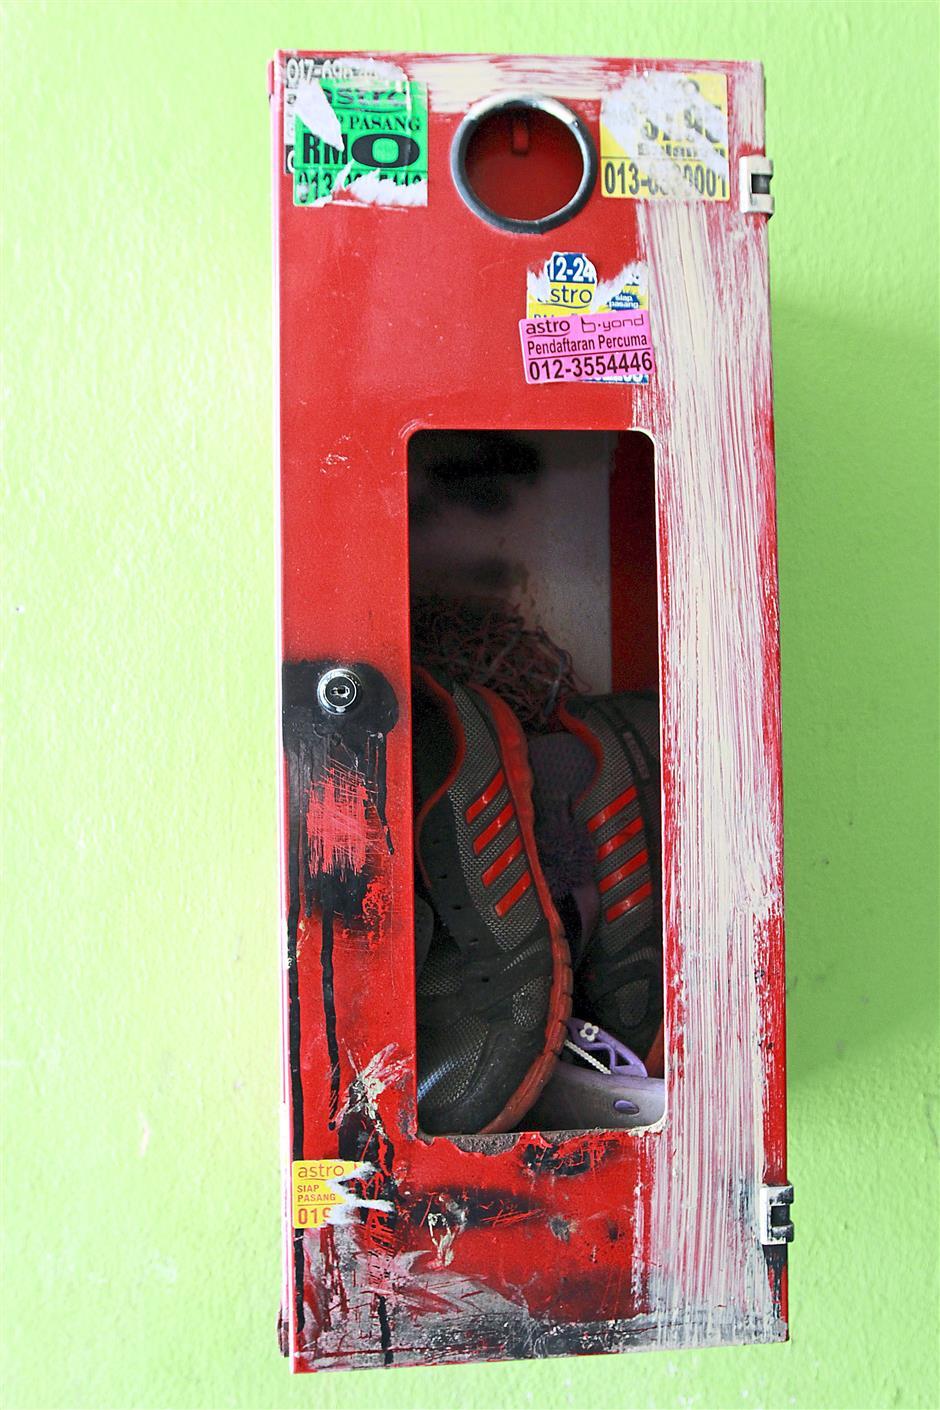 A fire extinguisher storage has become a shoe box in PPR Kota Damansara